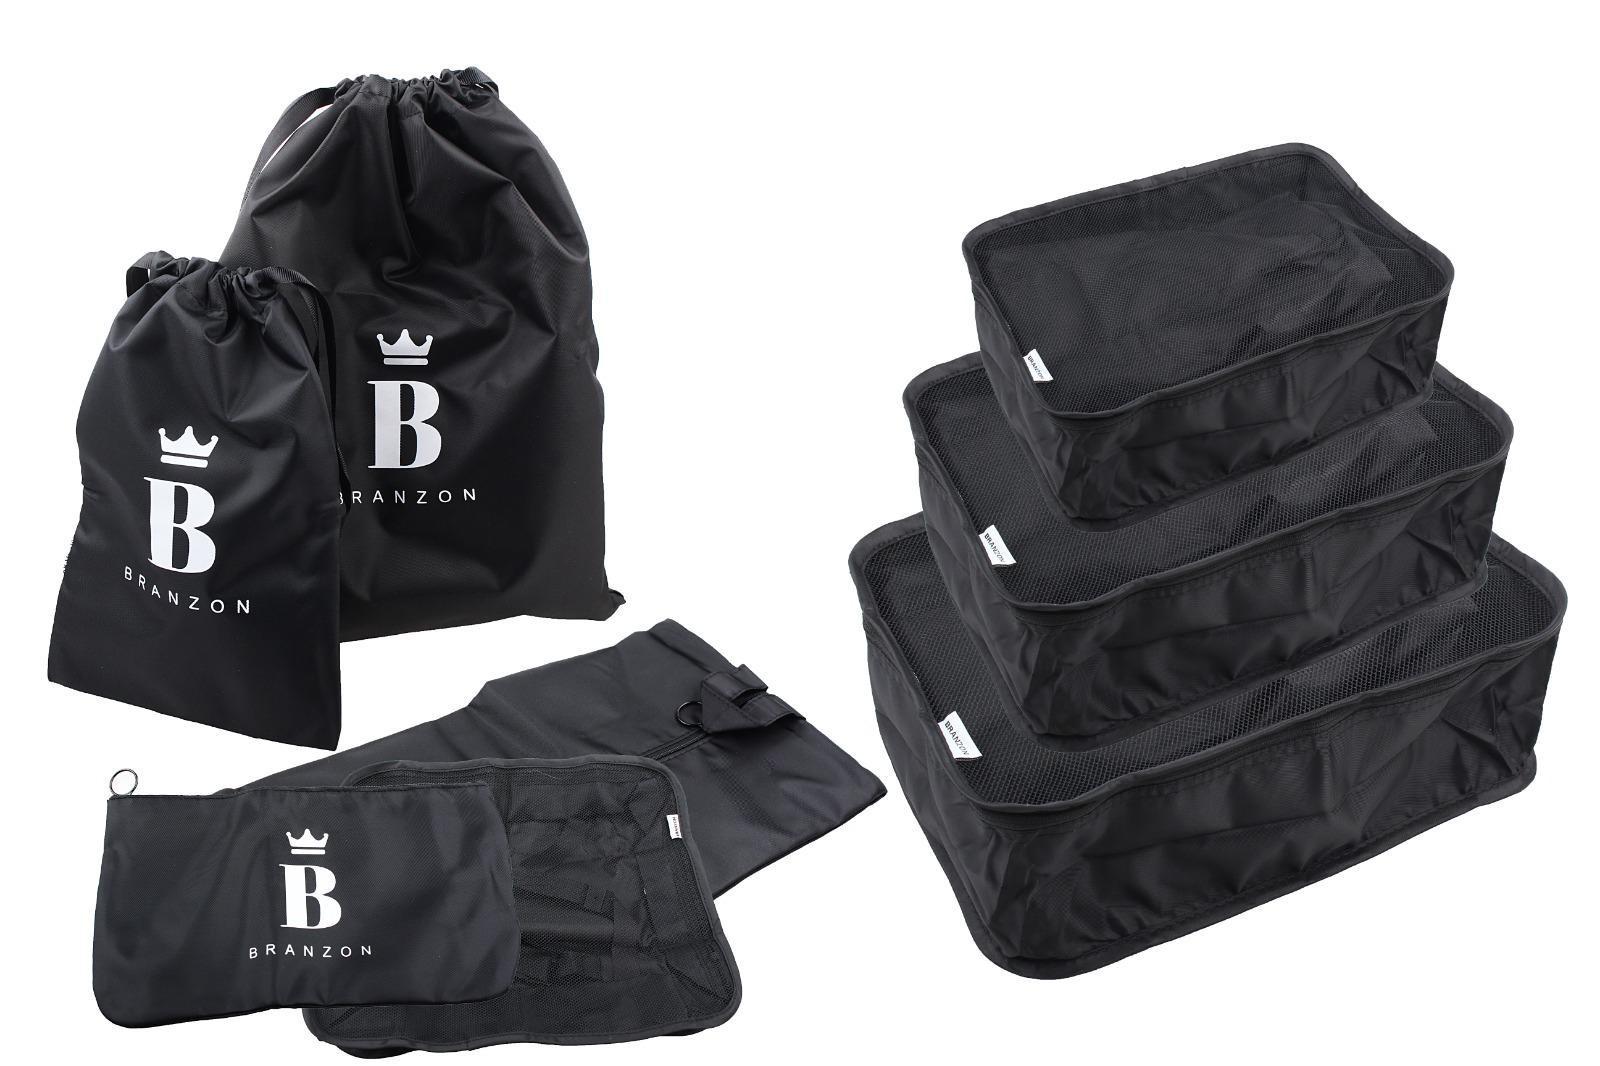 Branzon Luggage Packing Organizer Sets, 8-Piece Sets, 210 Sets, Est. Original Retail €4,618, Tanna, DE